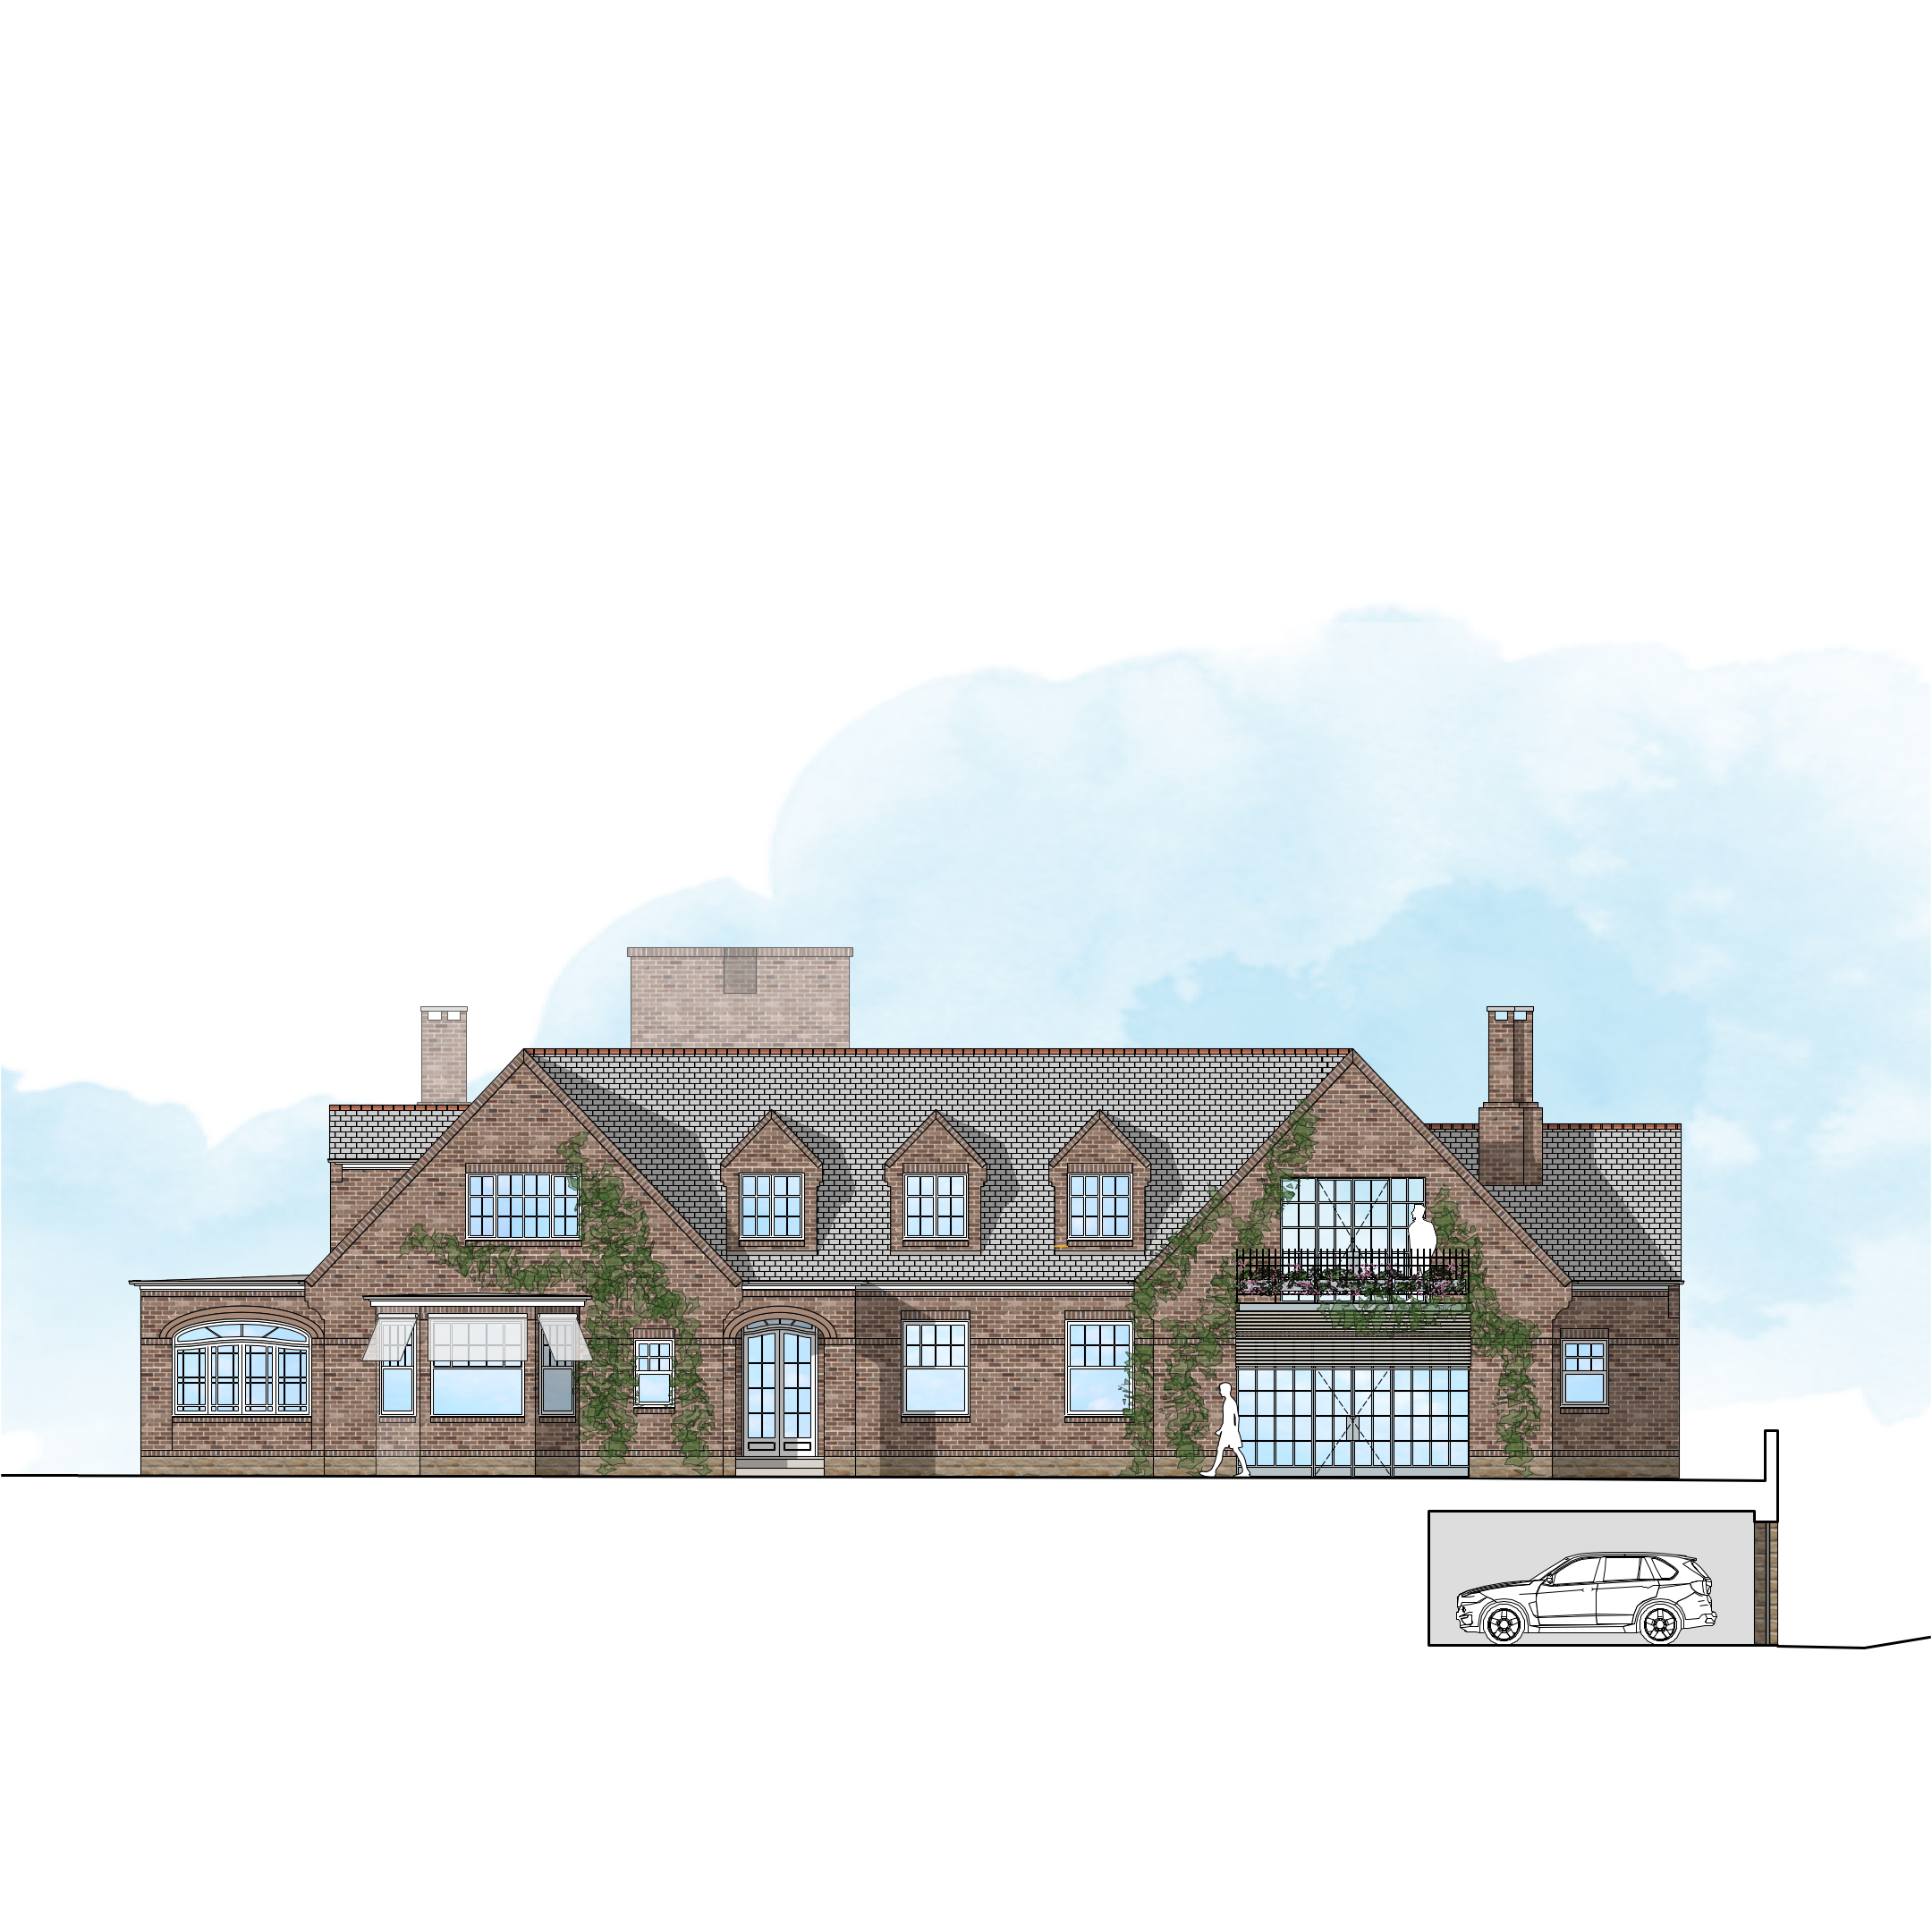 James Allen Architect Grasemere House 1.jpg